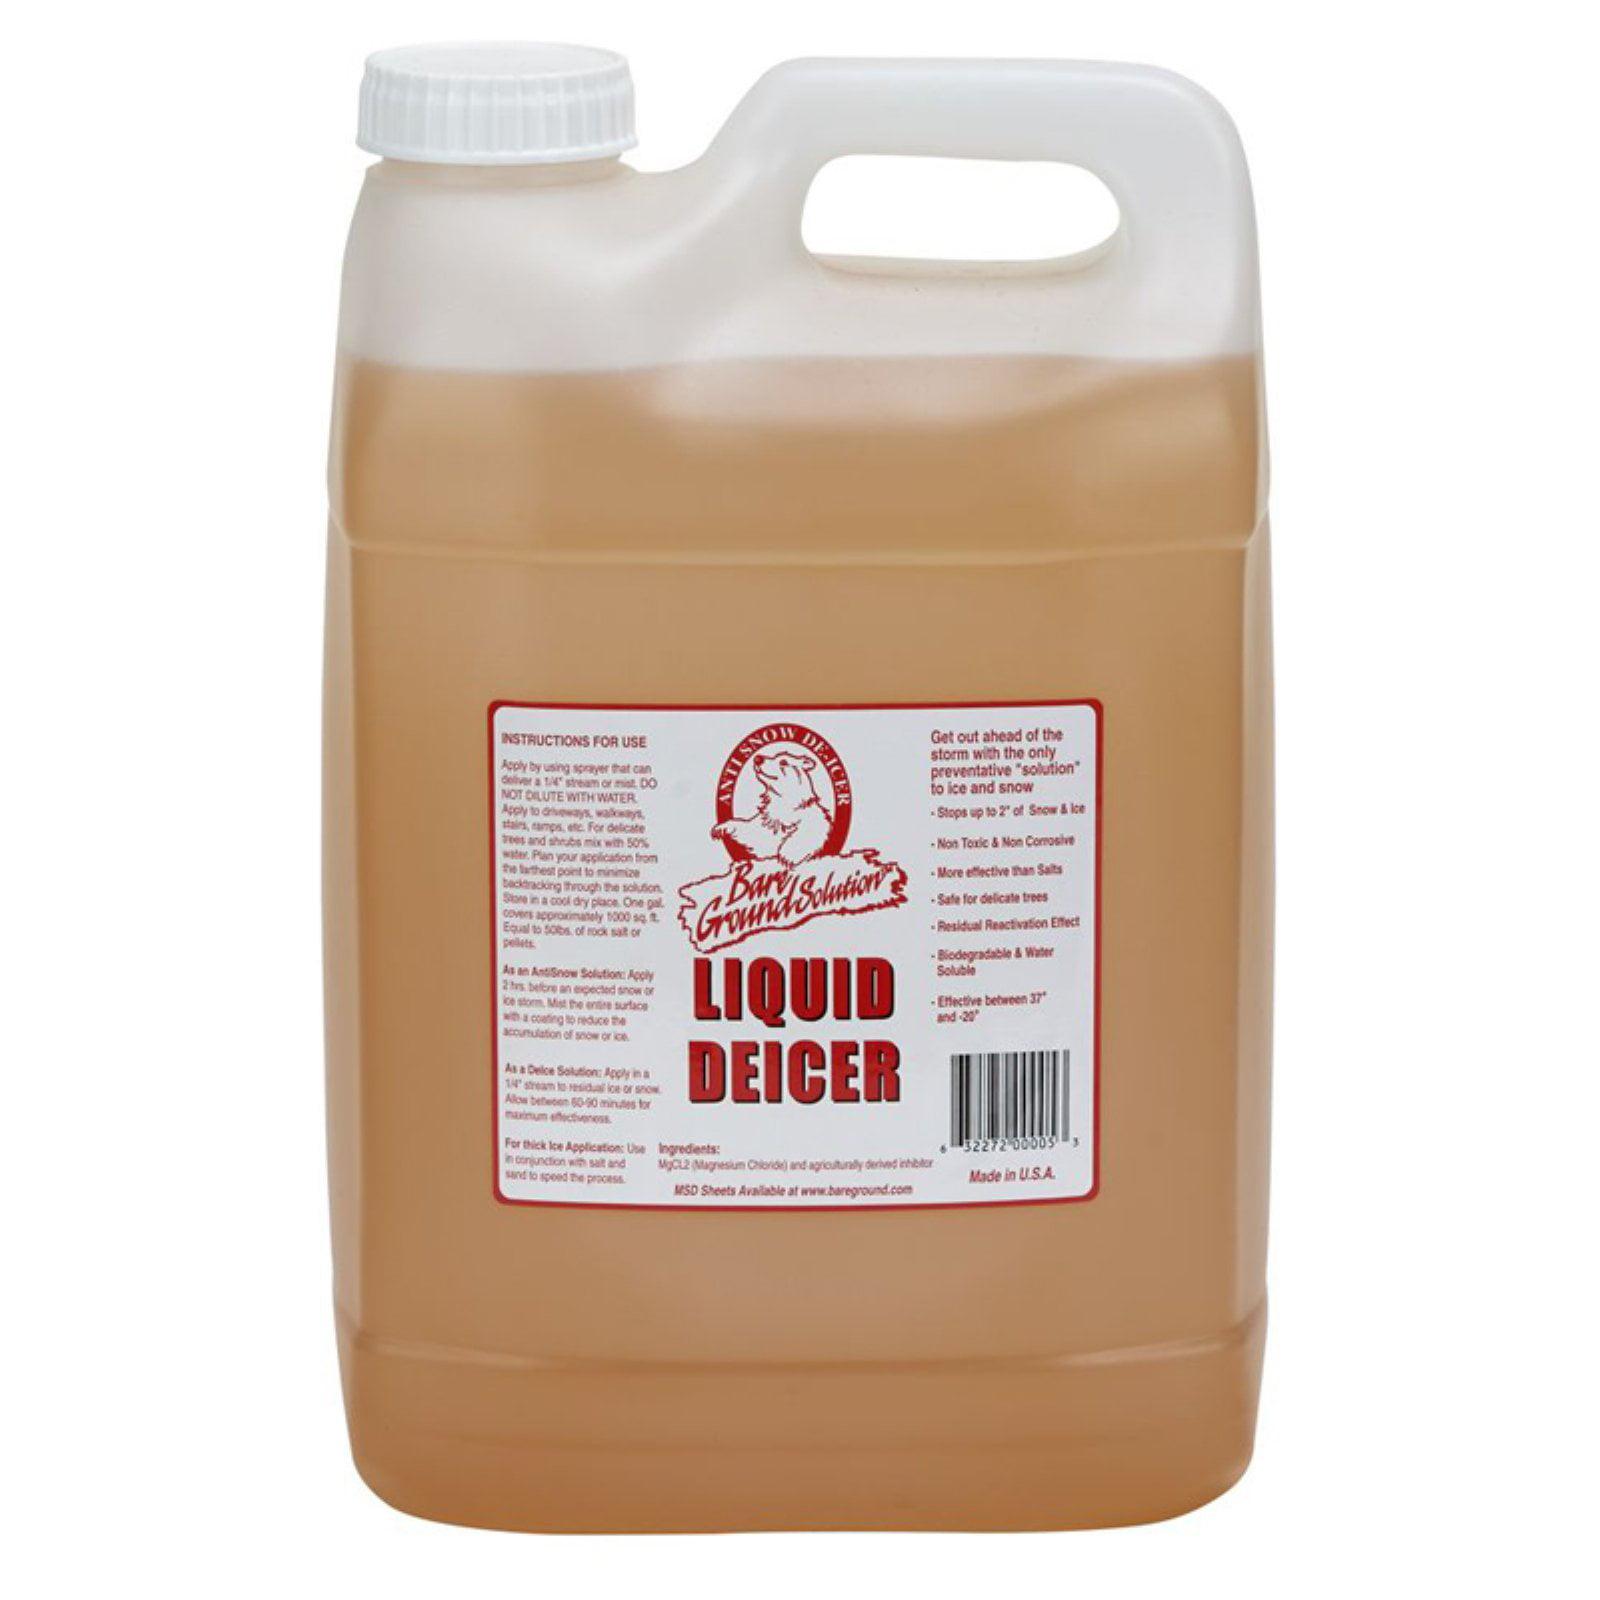 Bare Ground liquid deicer (Base UPC 0063227241111) Size 2.5 Gal